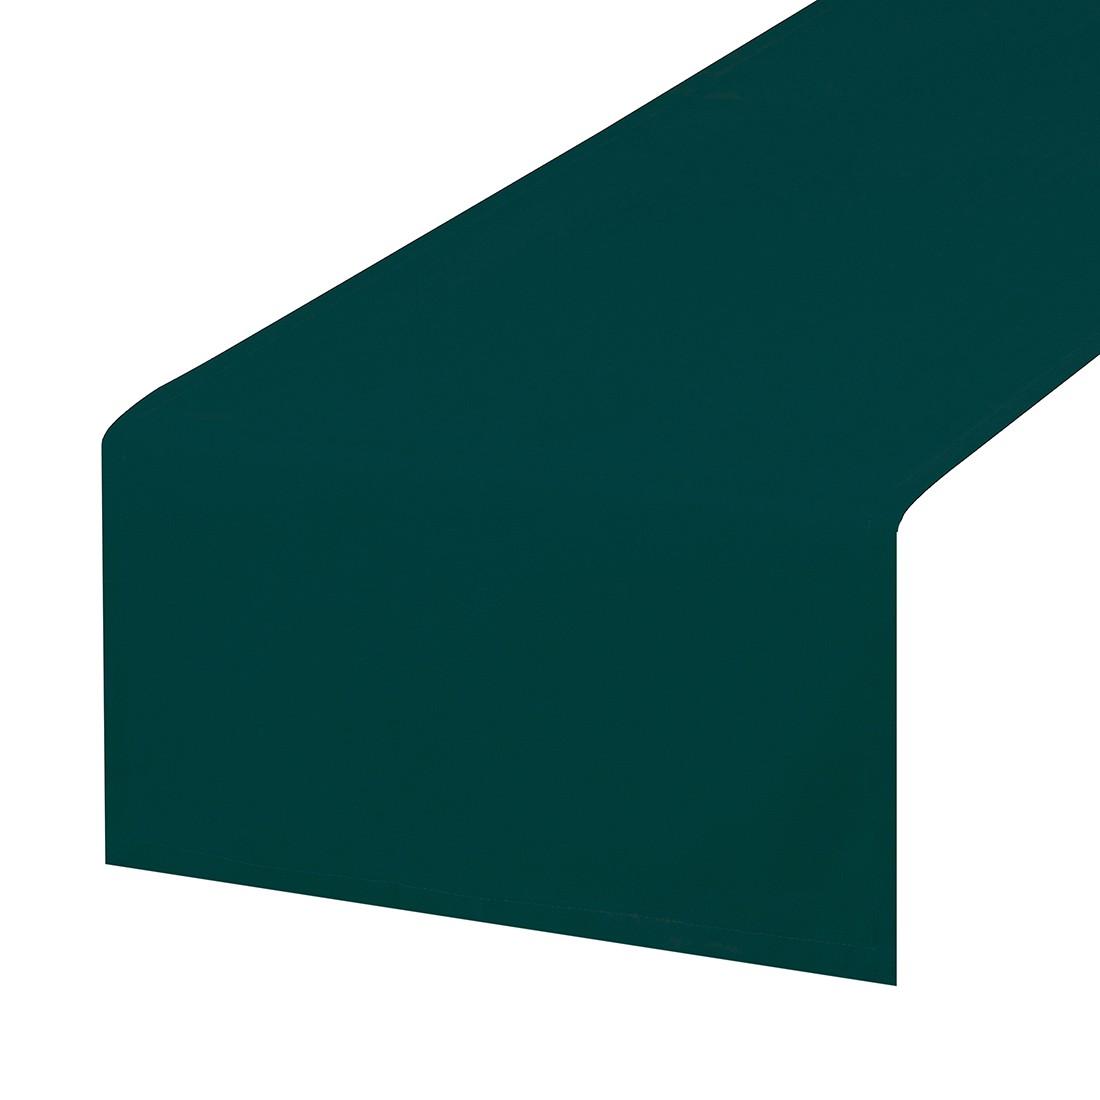 Tafelloper T- Dove - aquamarijn - afmetingen: 50x150cm, Tom Tailor